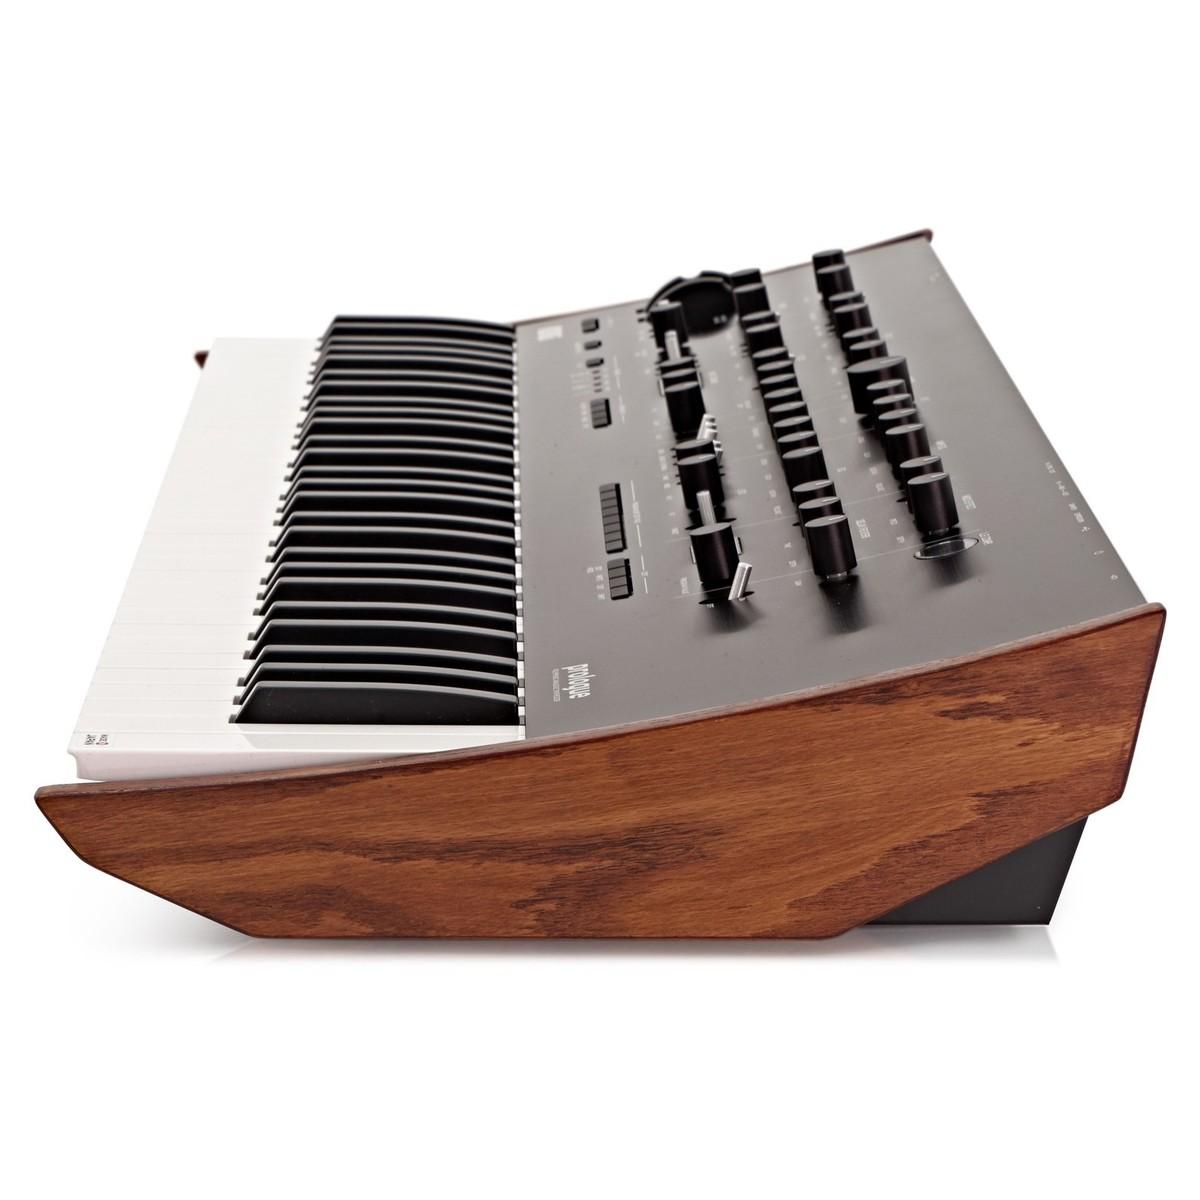 Korg PROLOGUE-16, Polyfonisk Analog Synthesizer - Sound1 com